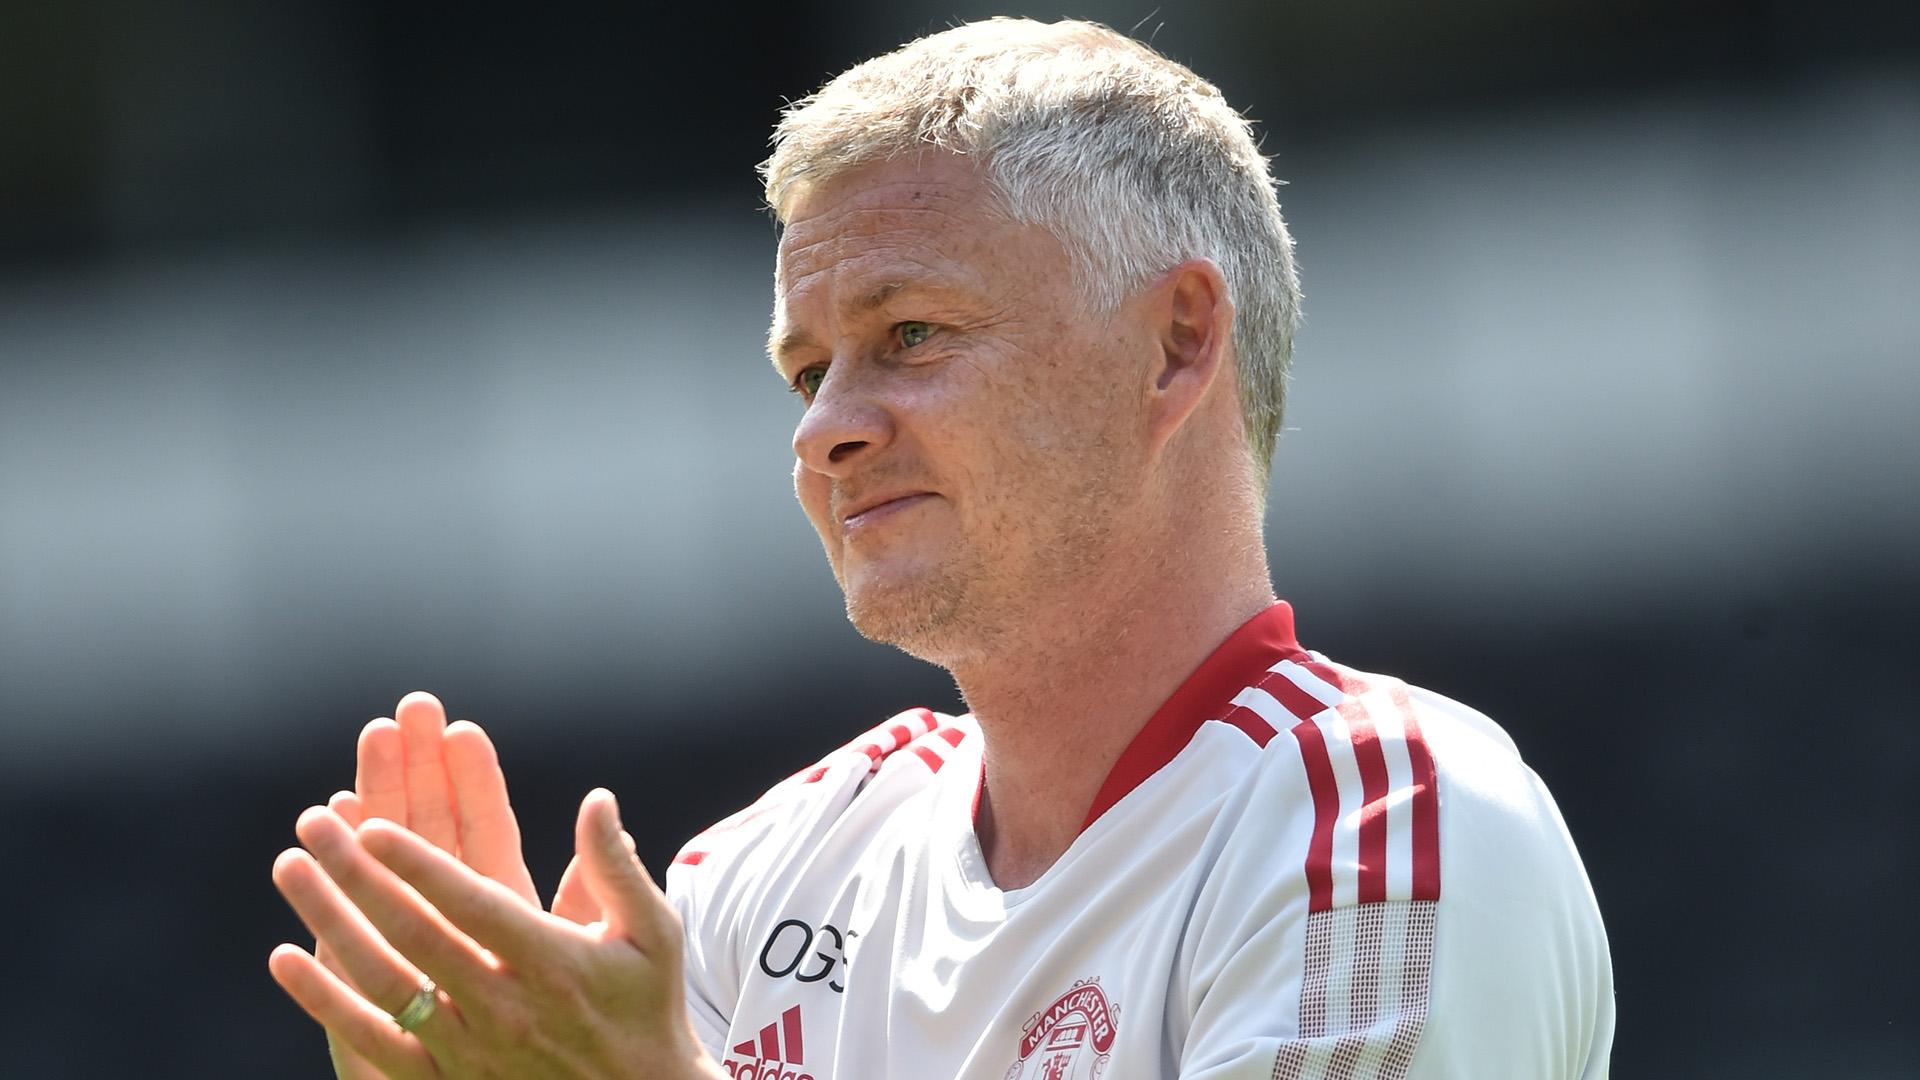 Solskjaer plays down hopes of Man Utd making more signings